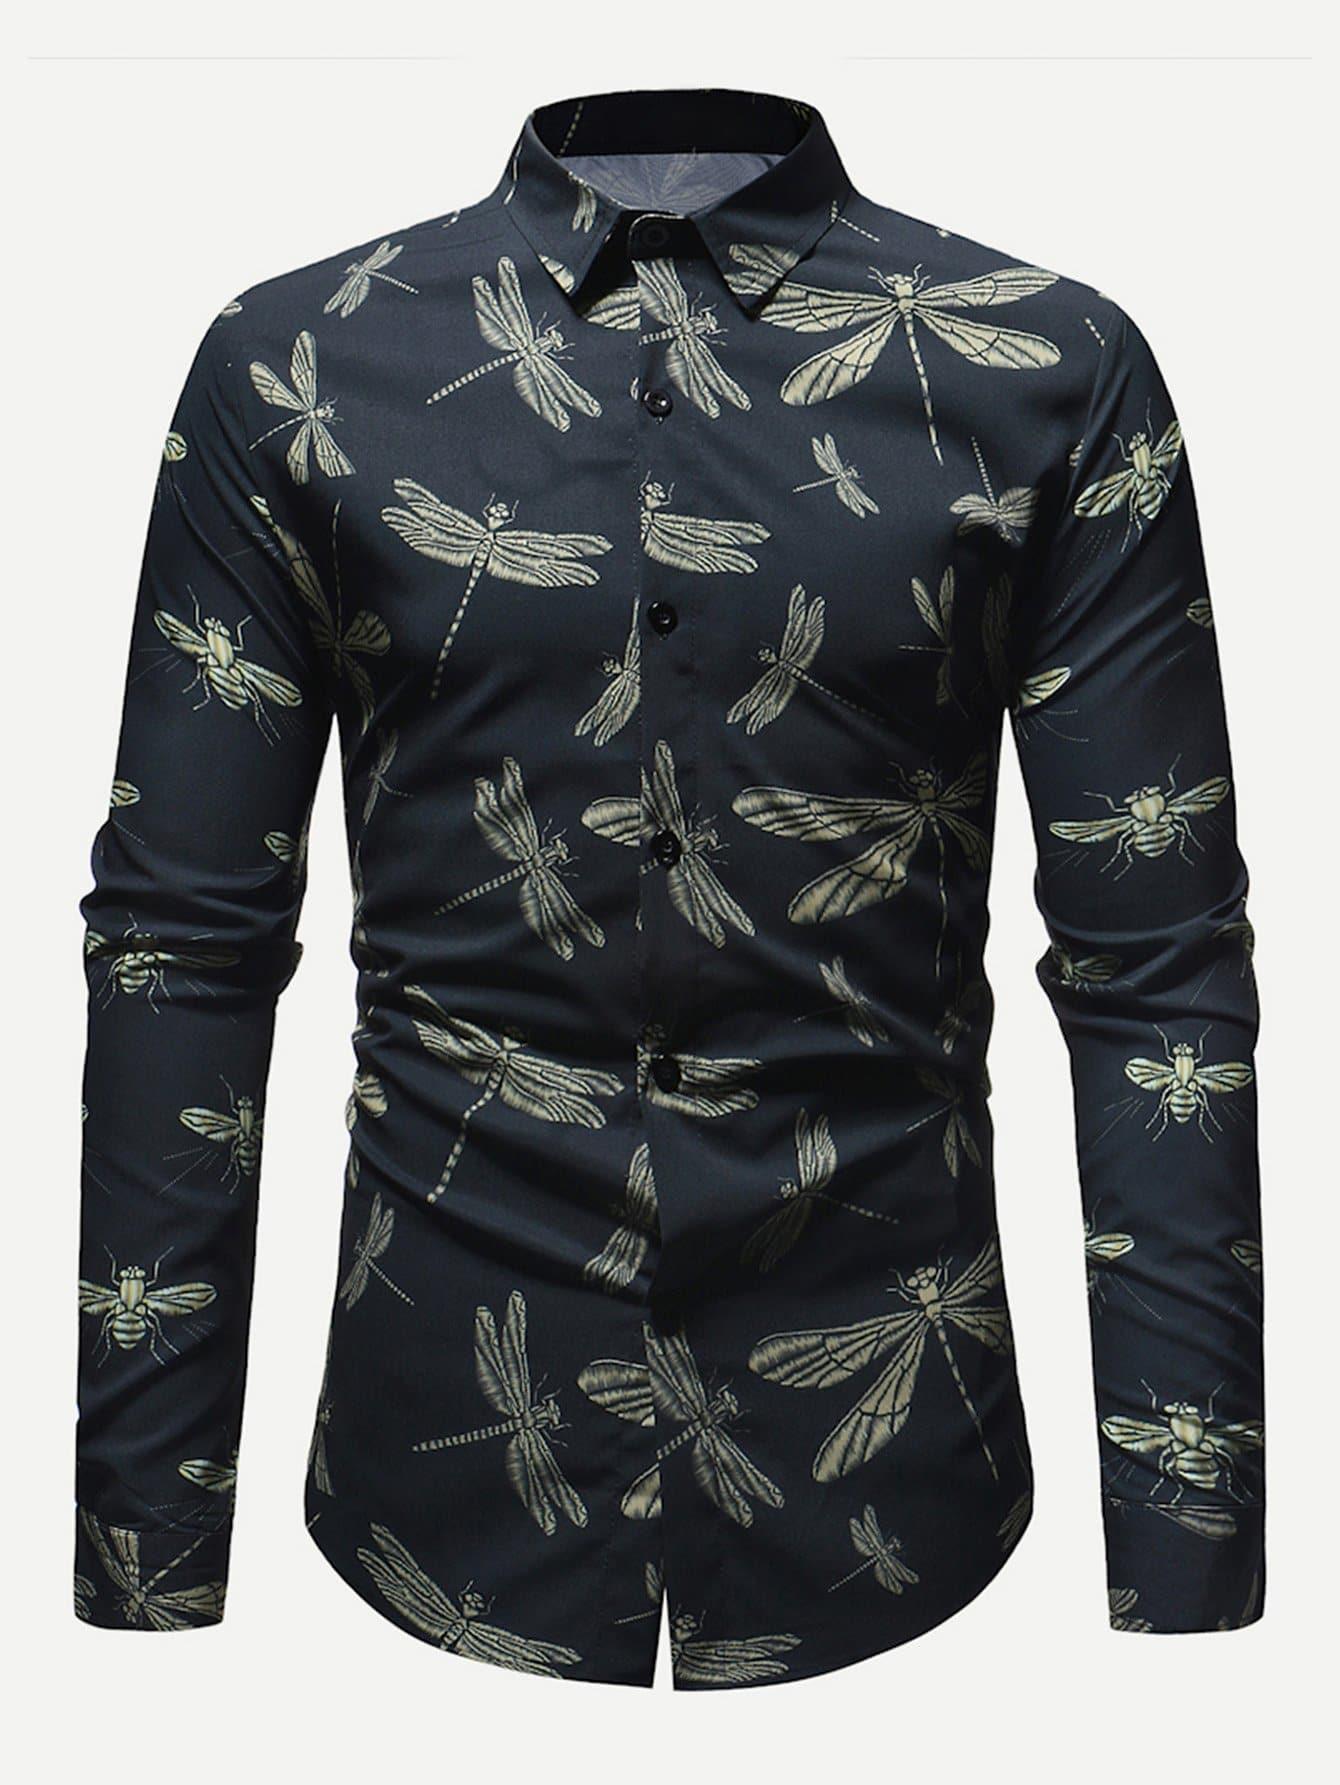 Men Dragonfly Overlay Print Shirt Men Dragonfly Overlay Print Shirt